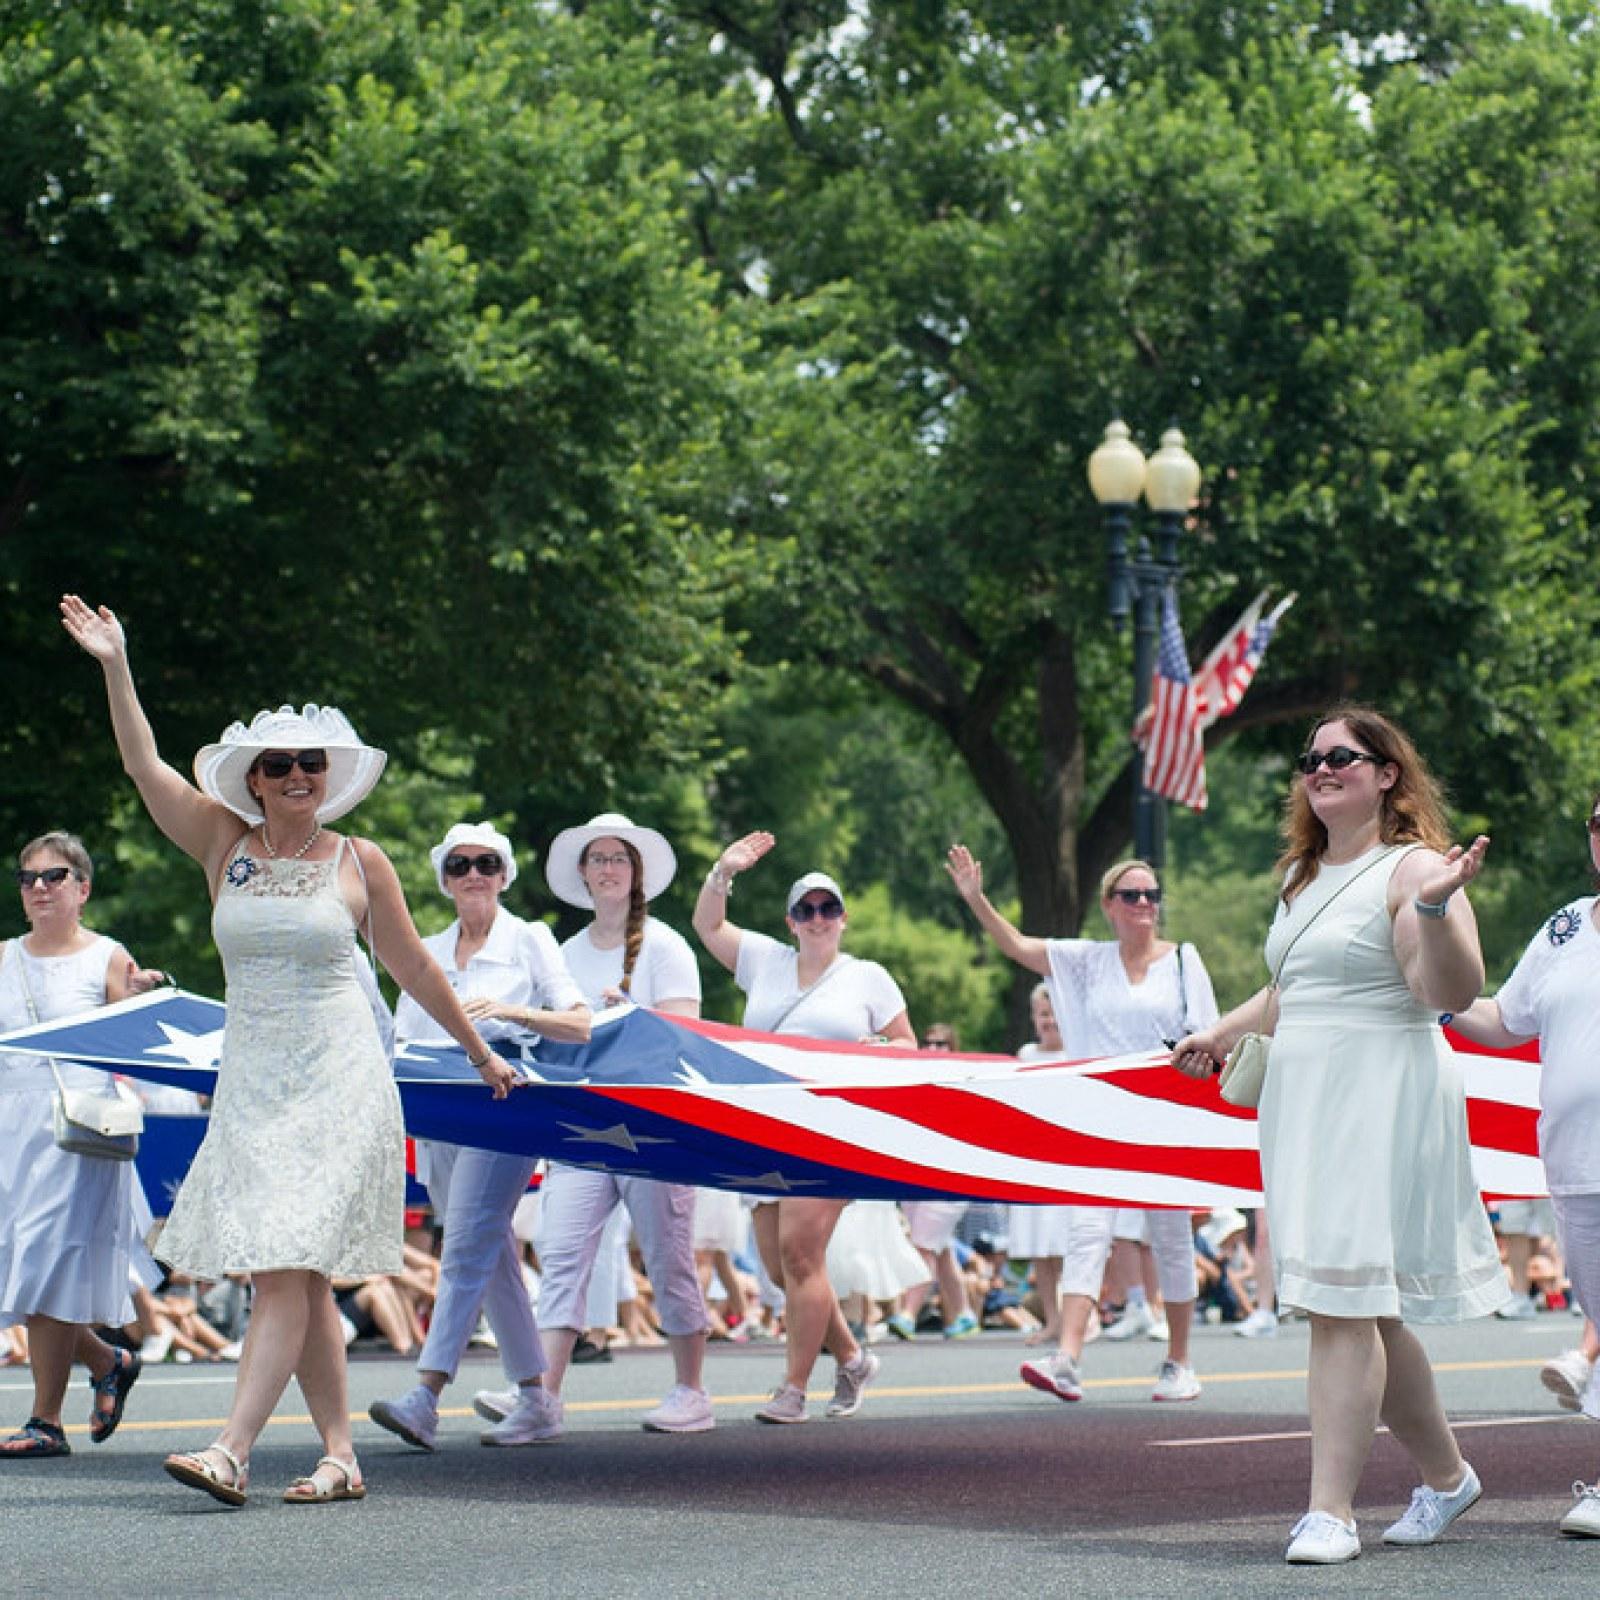 washington dc 4th of july parade 2020